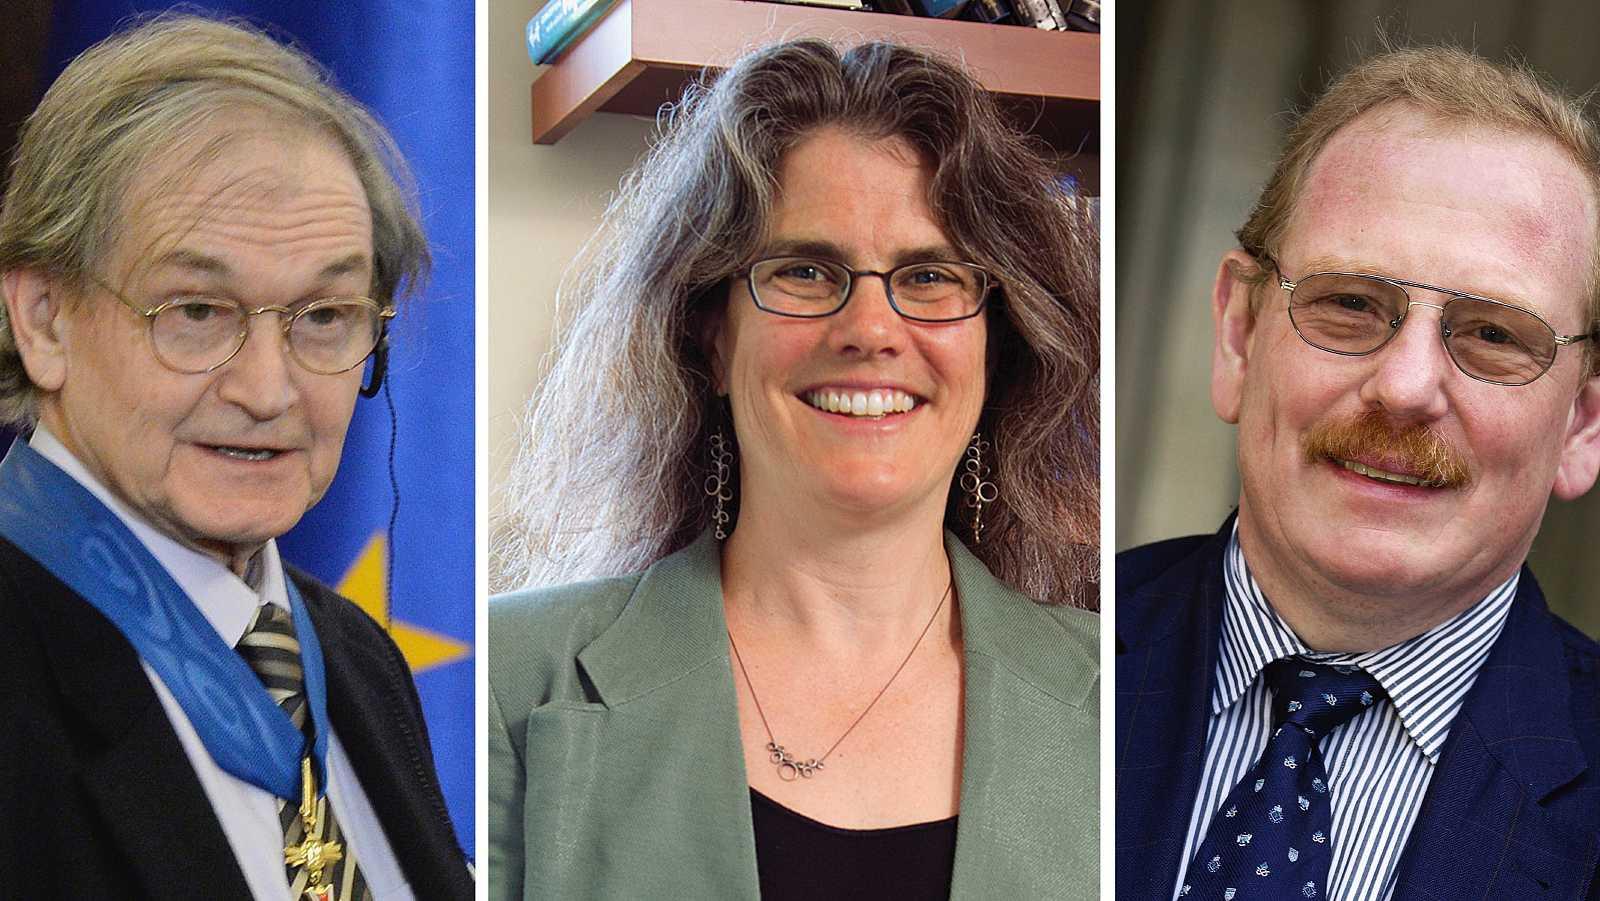 De izquierda a derecha: Roger Penrose, Andrea Ghez y Reinhard Genzel.